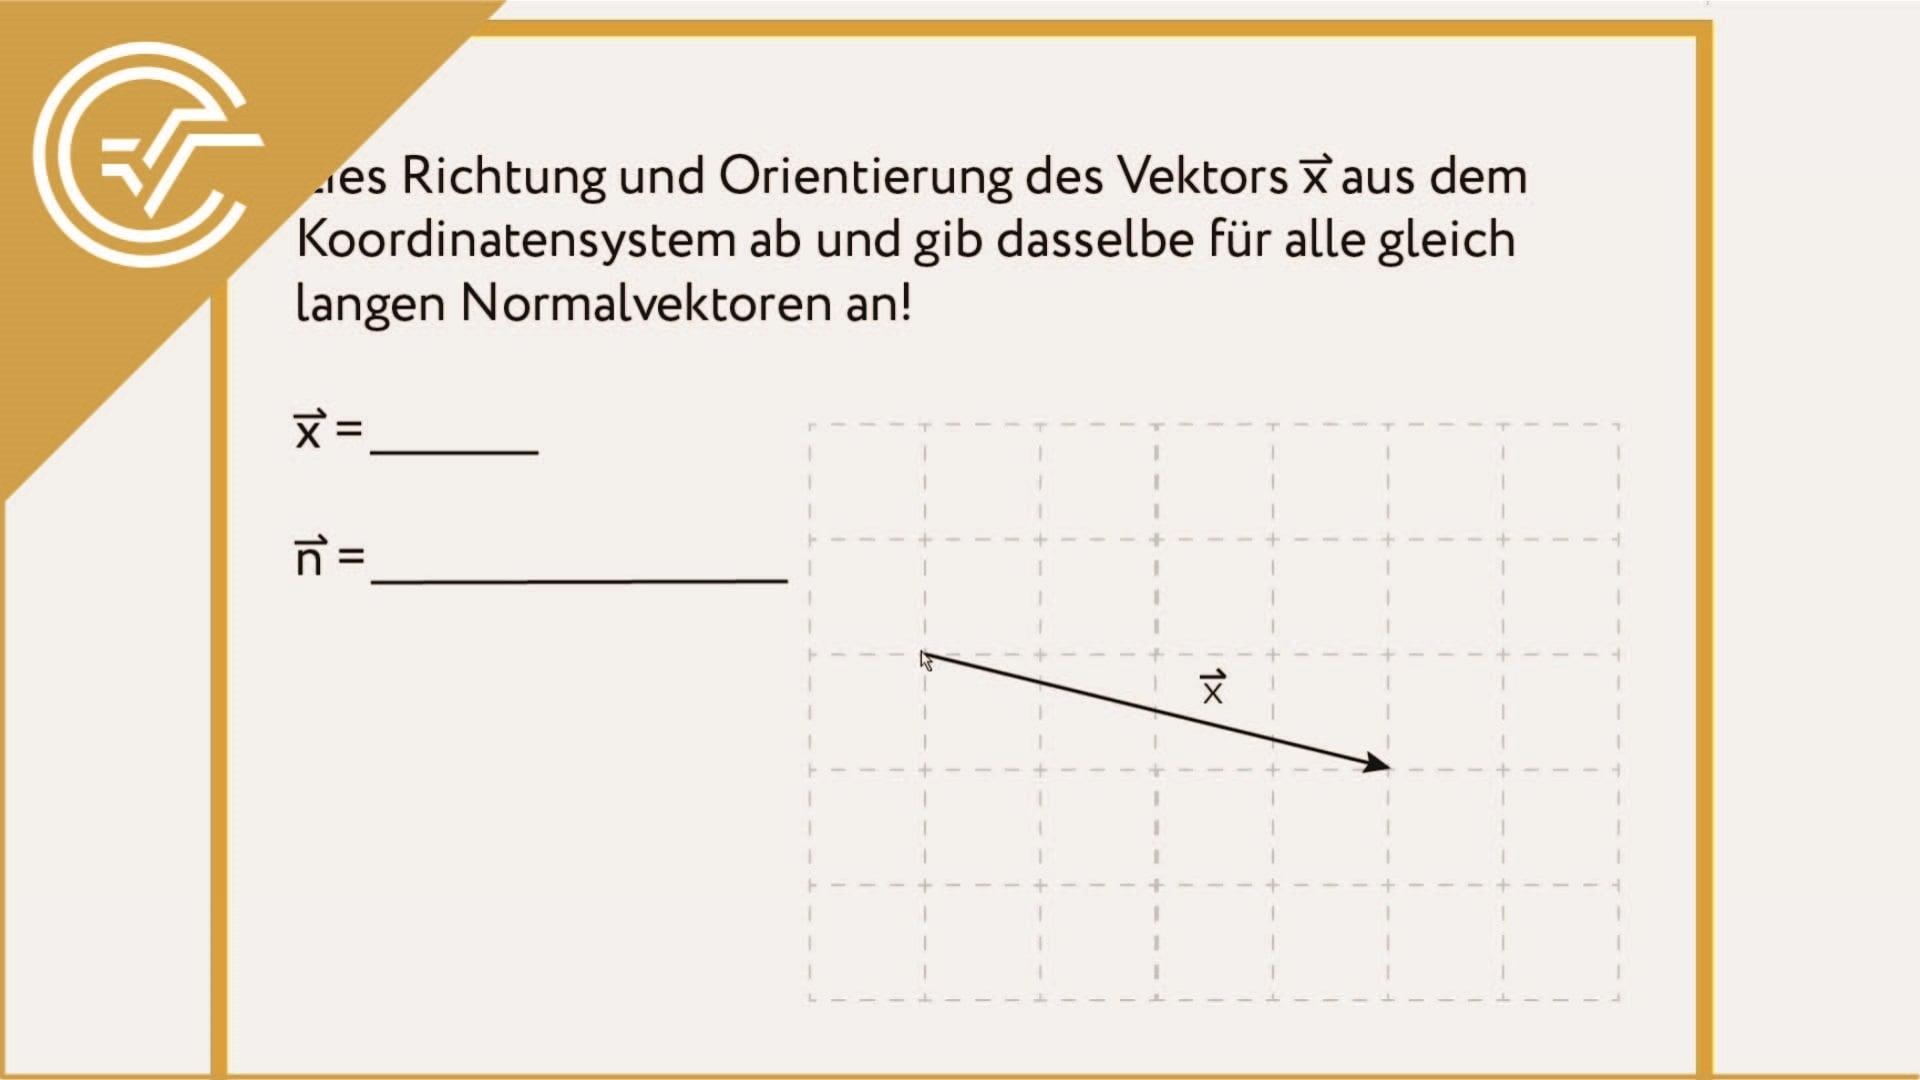 AG 3.5 - Normalvektor 2